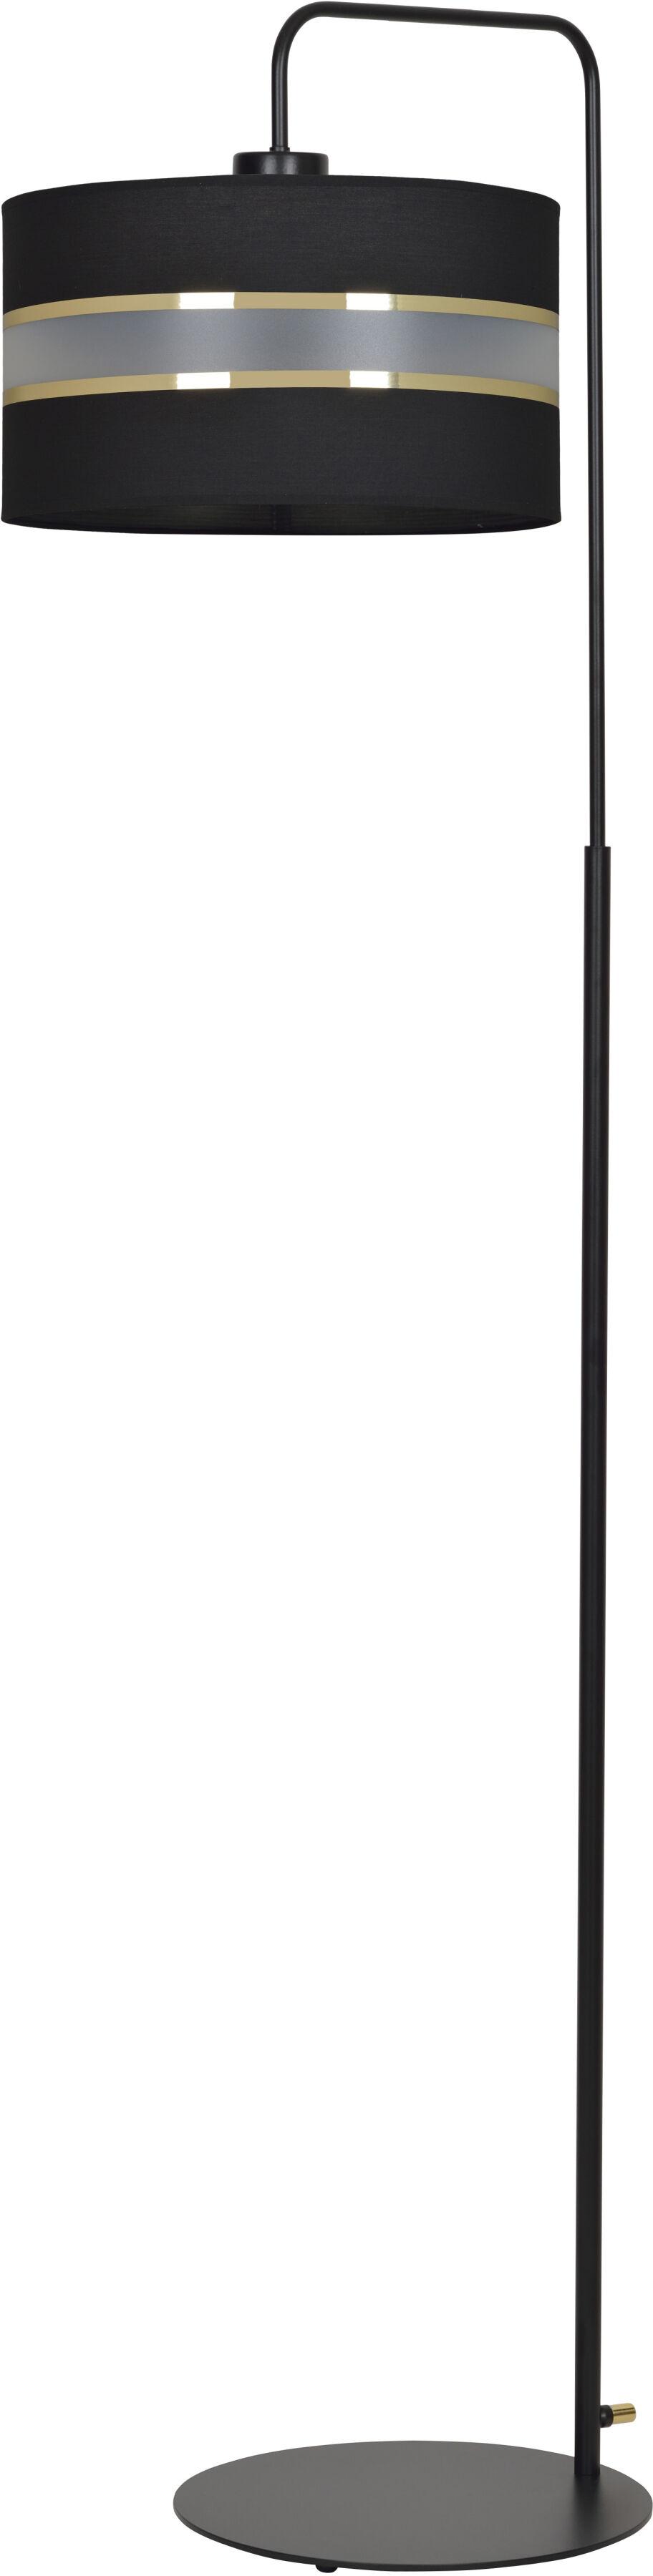 Emibig MOGI LP1 BLACK 601/LP1 lampa podłogowa metalowa duży czarny abażur elegancka 1x60W E27 150cm